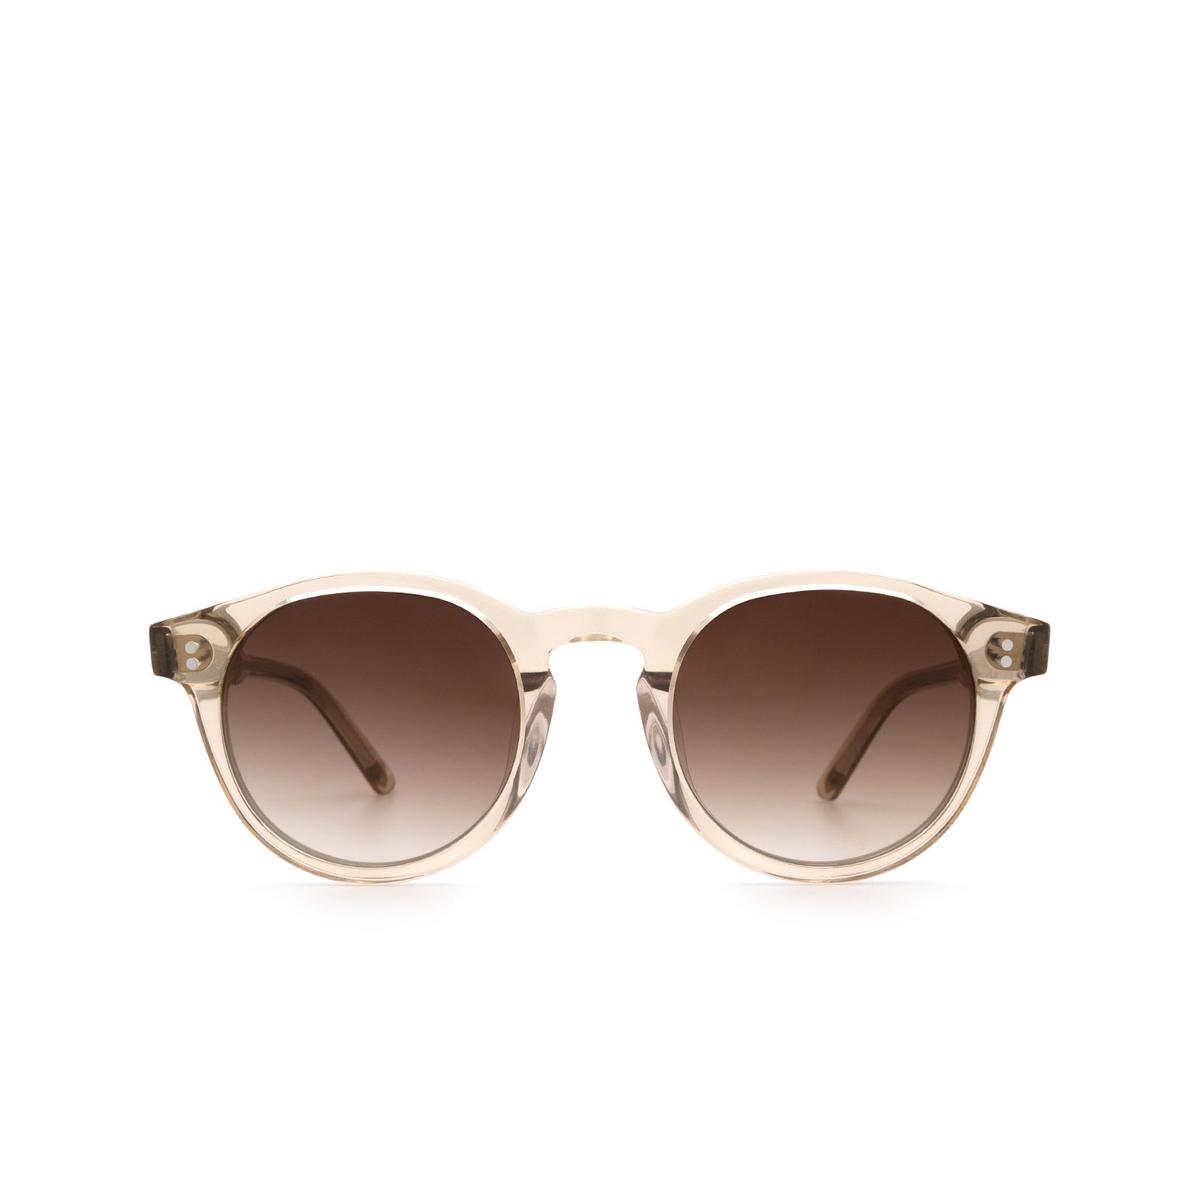 Chimi® Round Sunglasses: 03 color Ecru - front view.